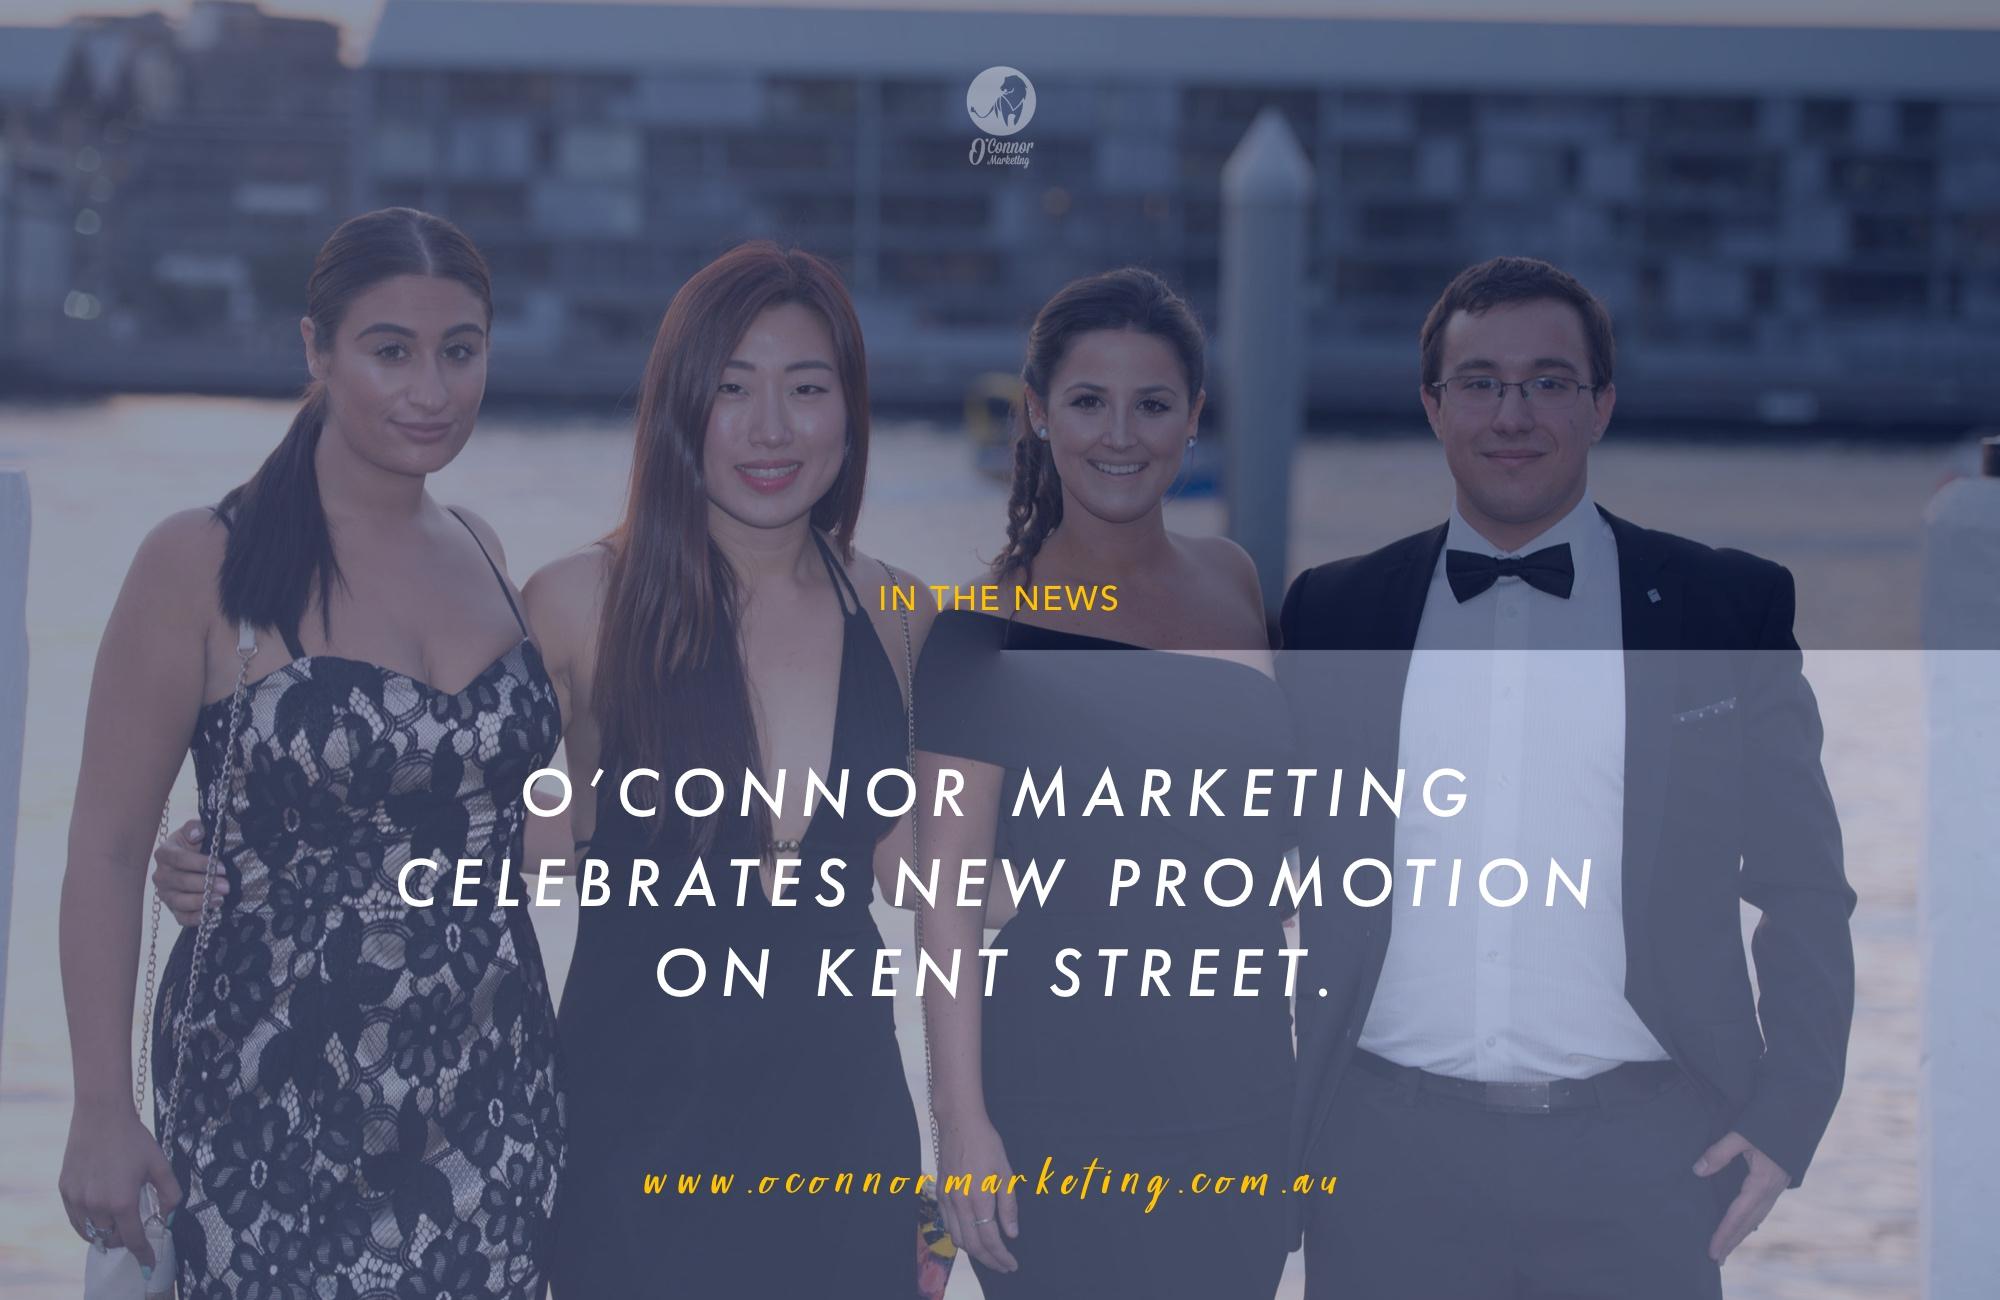 O'Connor Marketing celebrates new promotion on Kent Street.